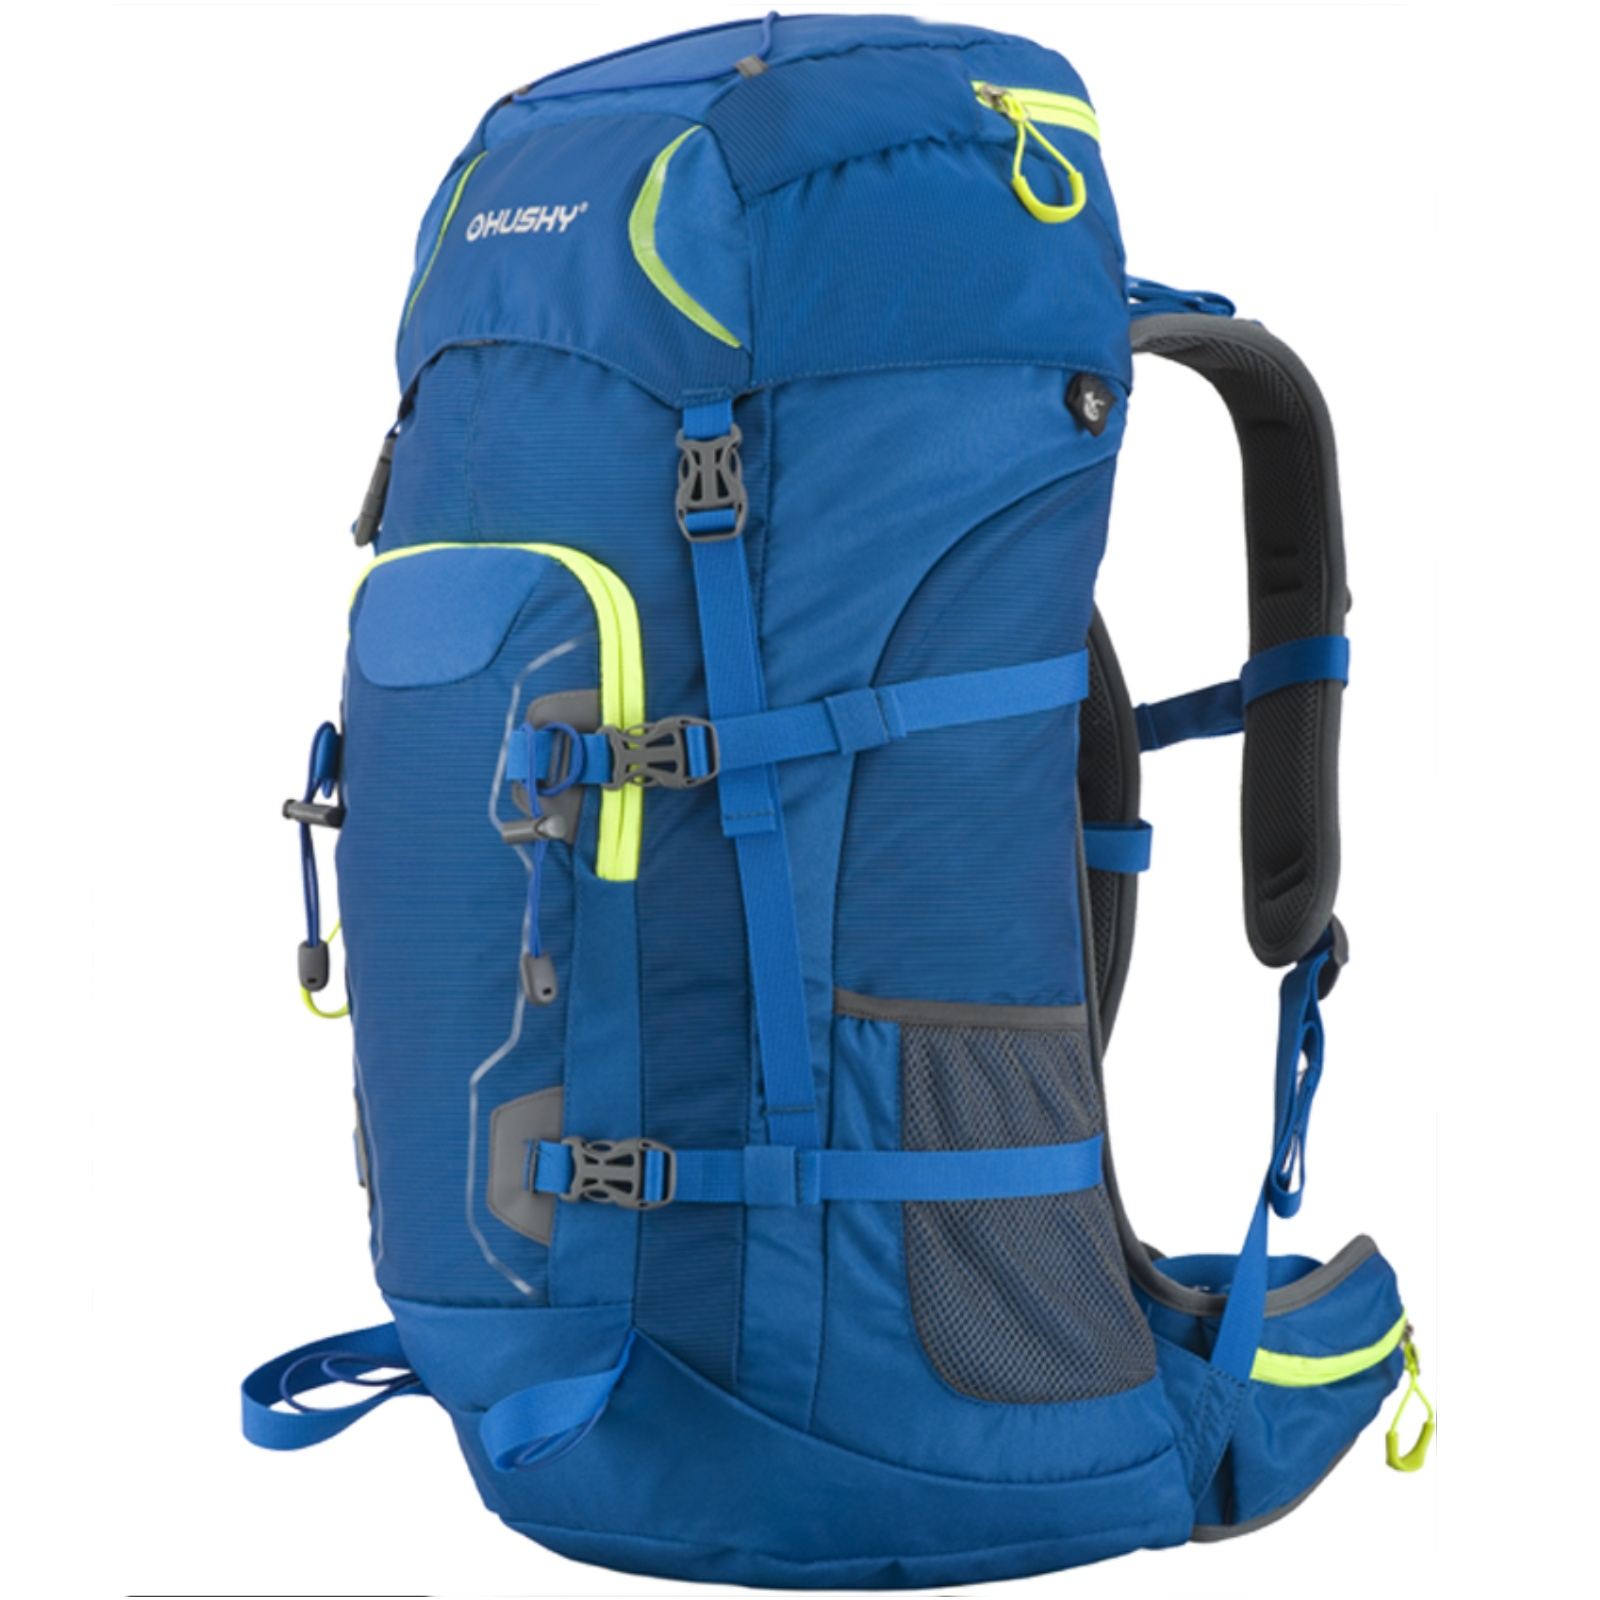 Batoh HUSKY Sloper 45 - modrý